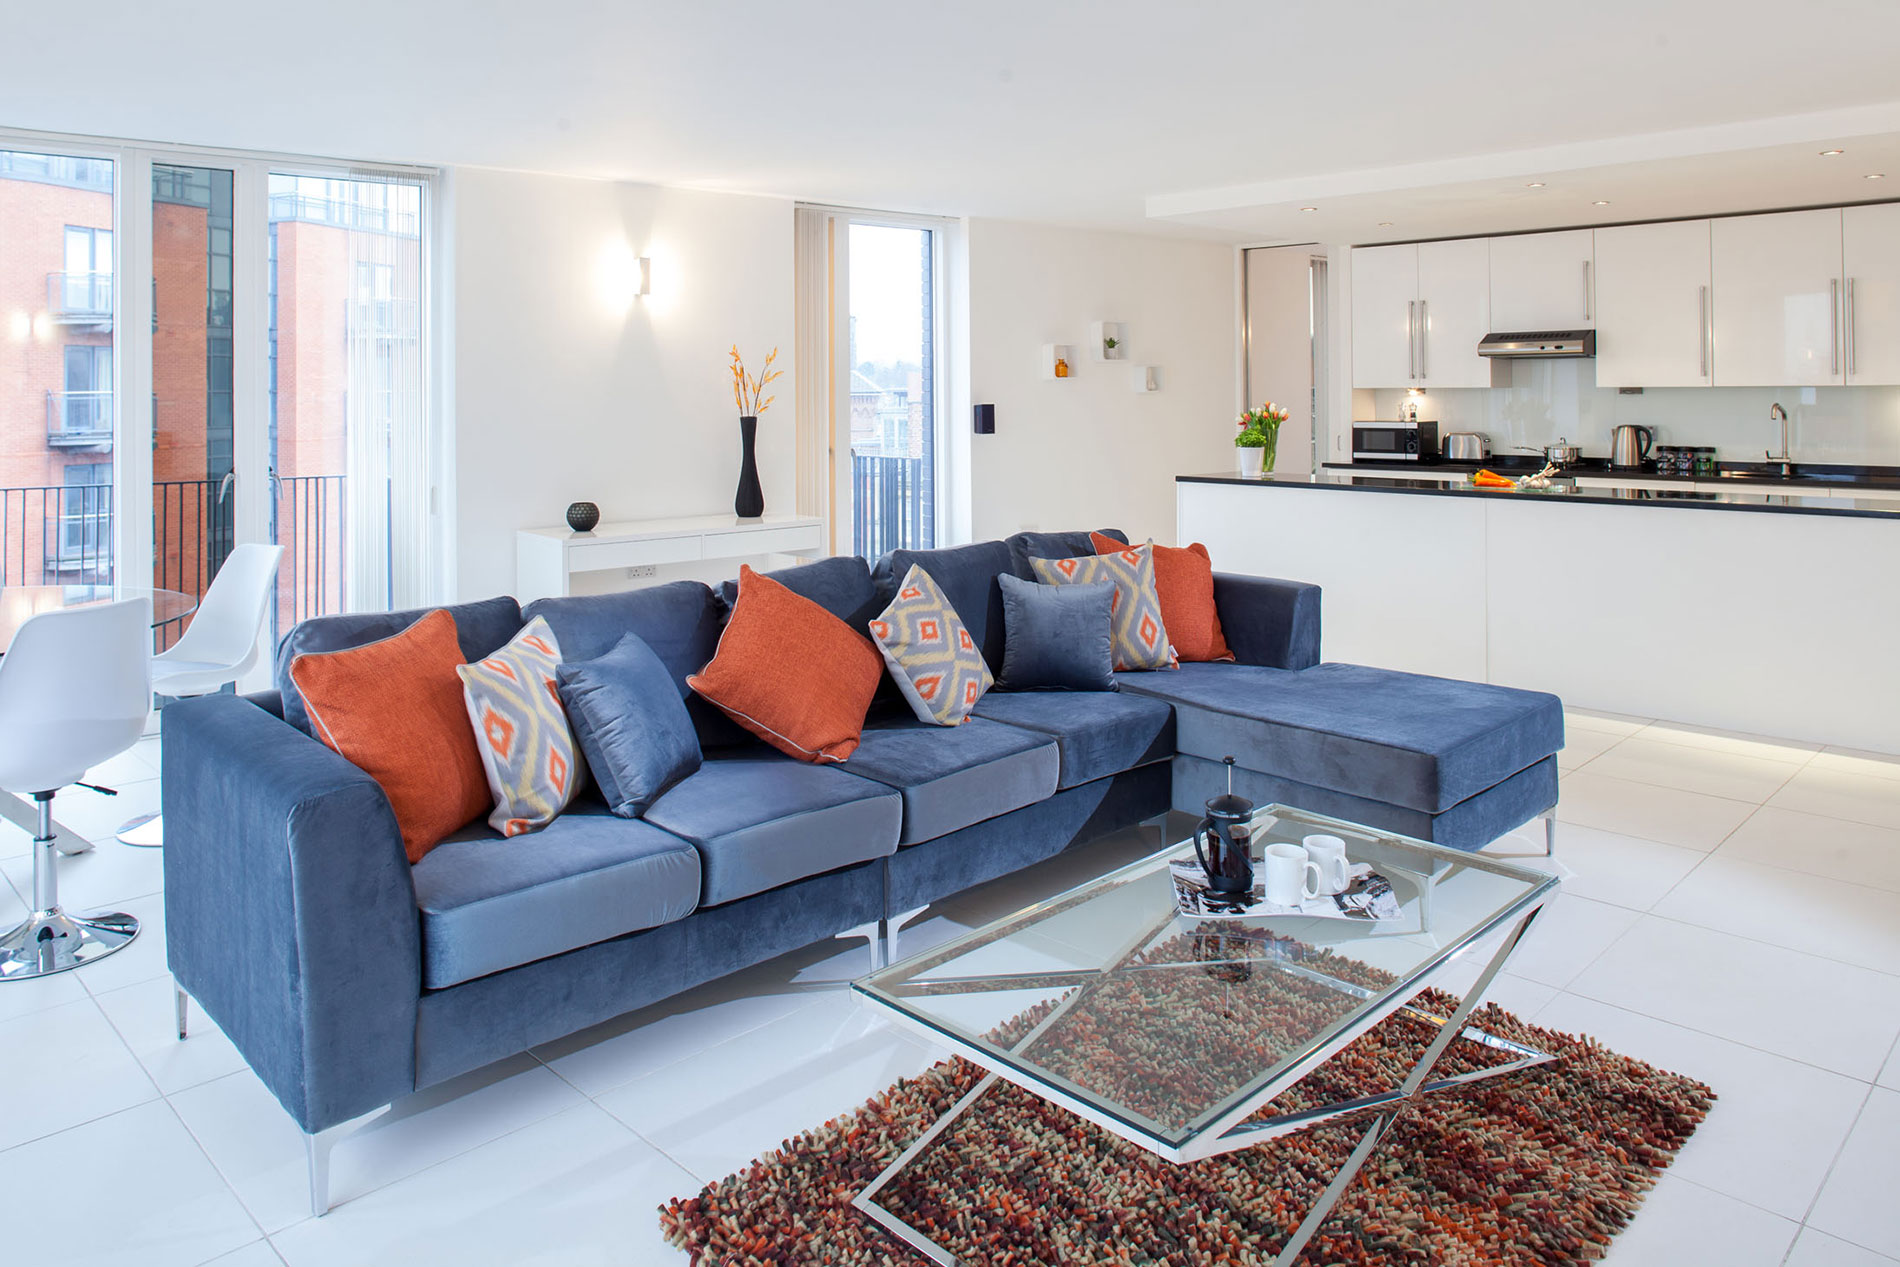 Cushions at Sinclair Apartments, Centre, Sheffield